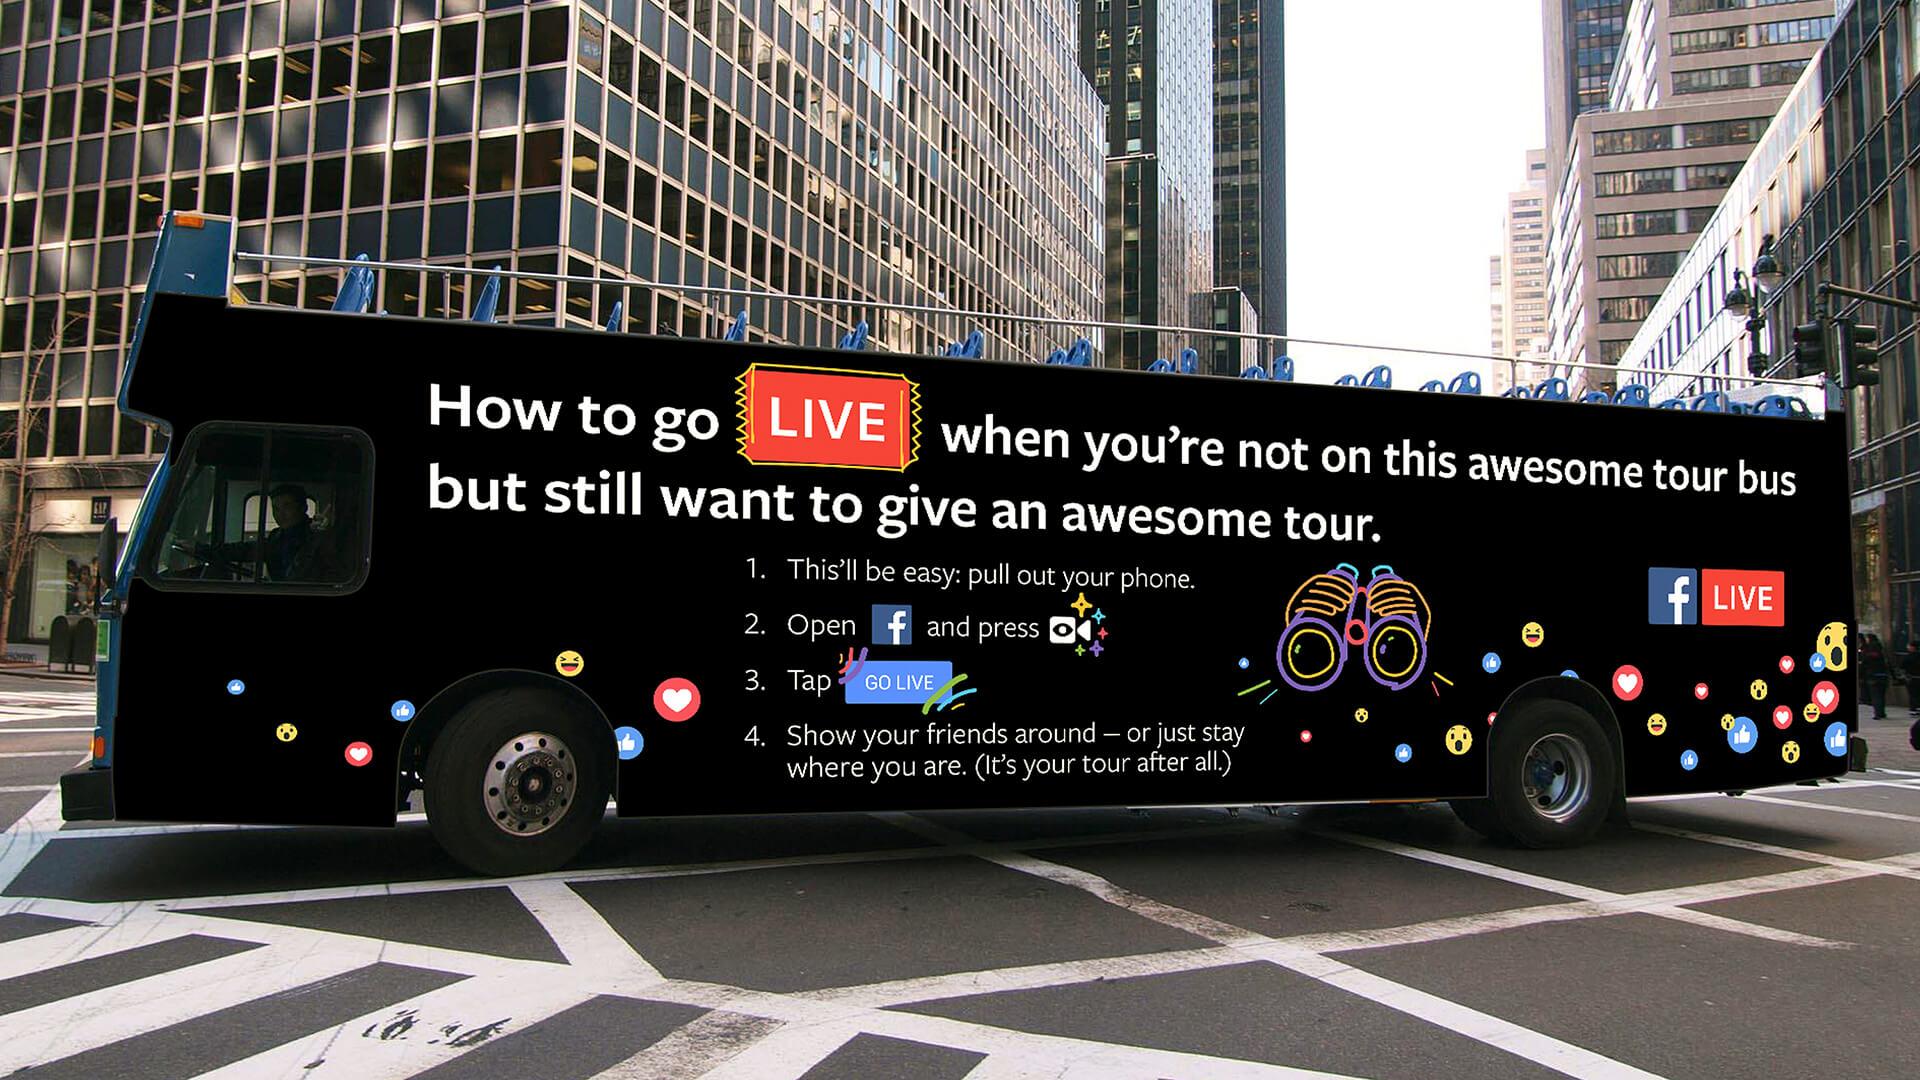 facebook-live-ad-tour-bus